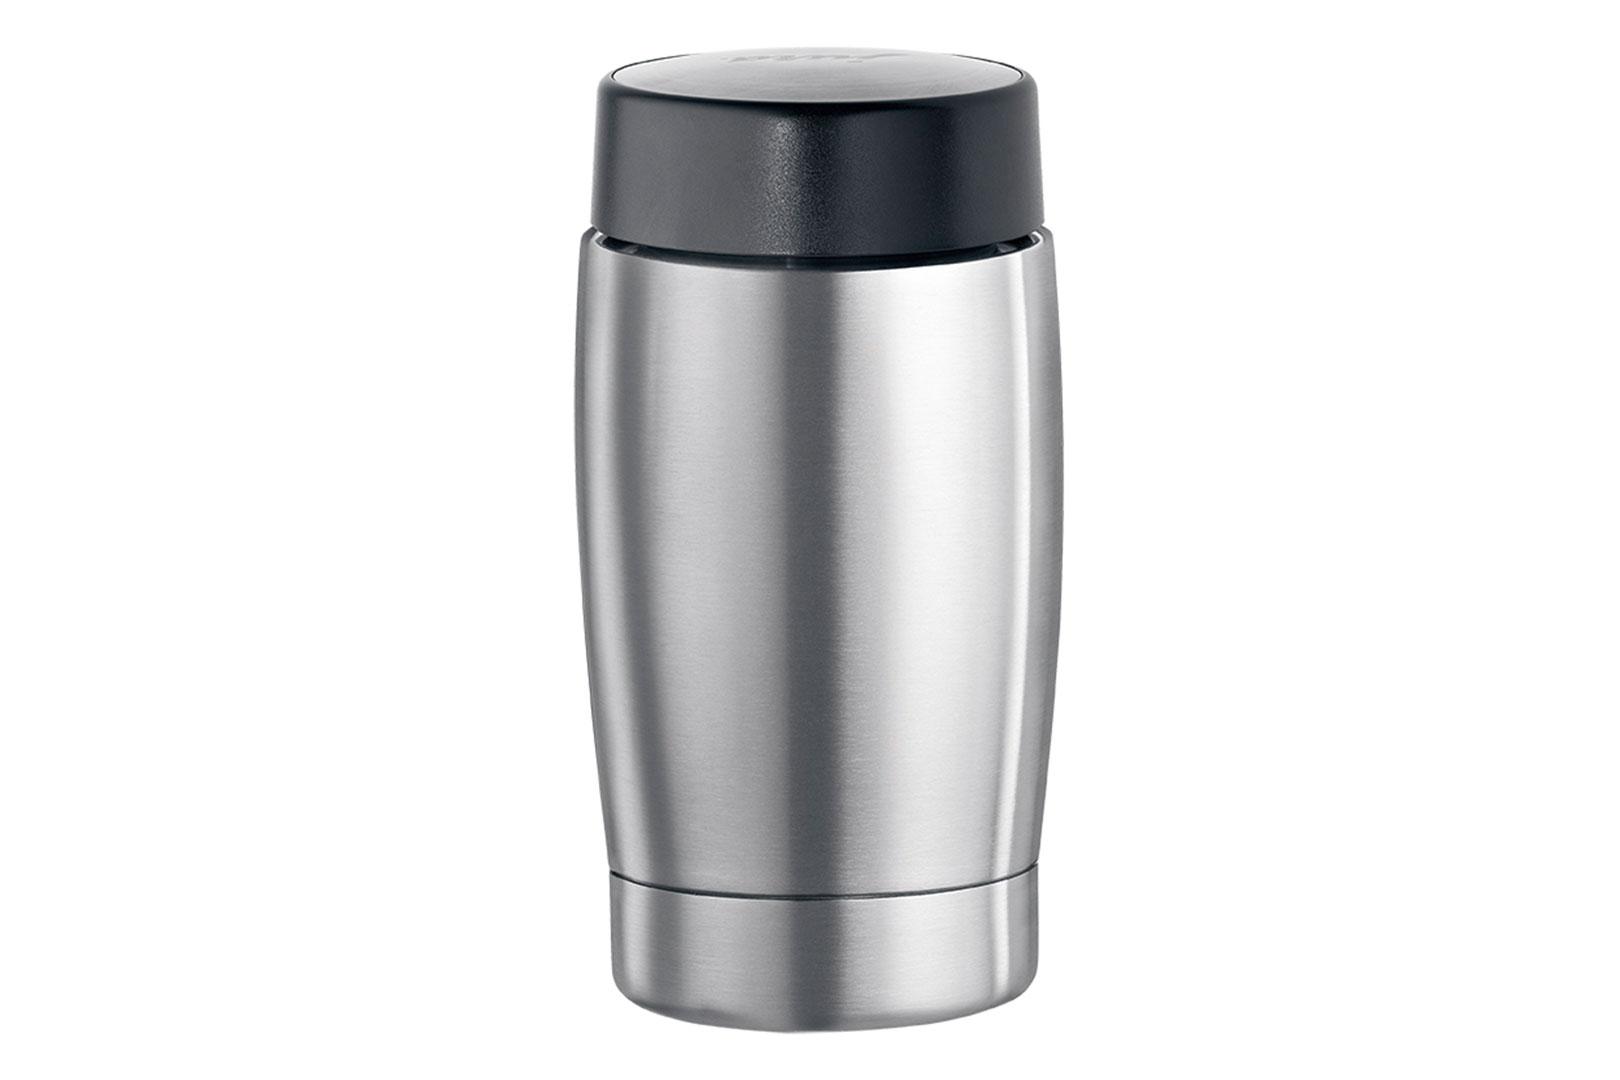 Jura Edelstahl-Isoliermilchbehälter 0,4 Liter